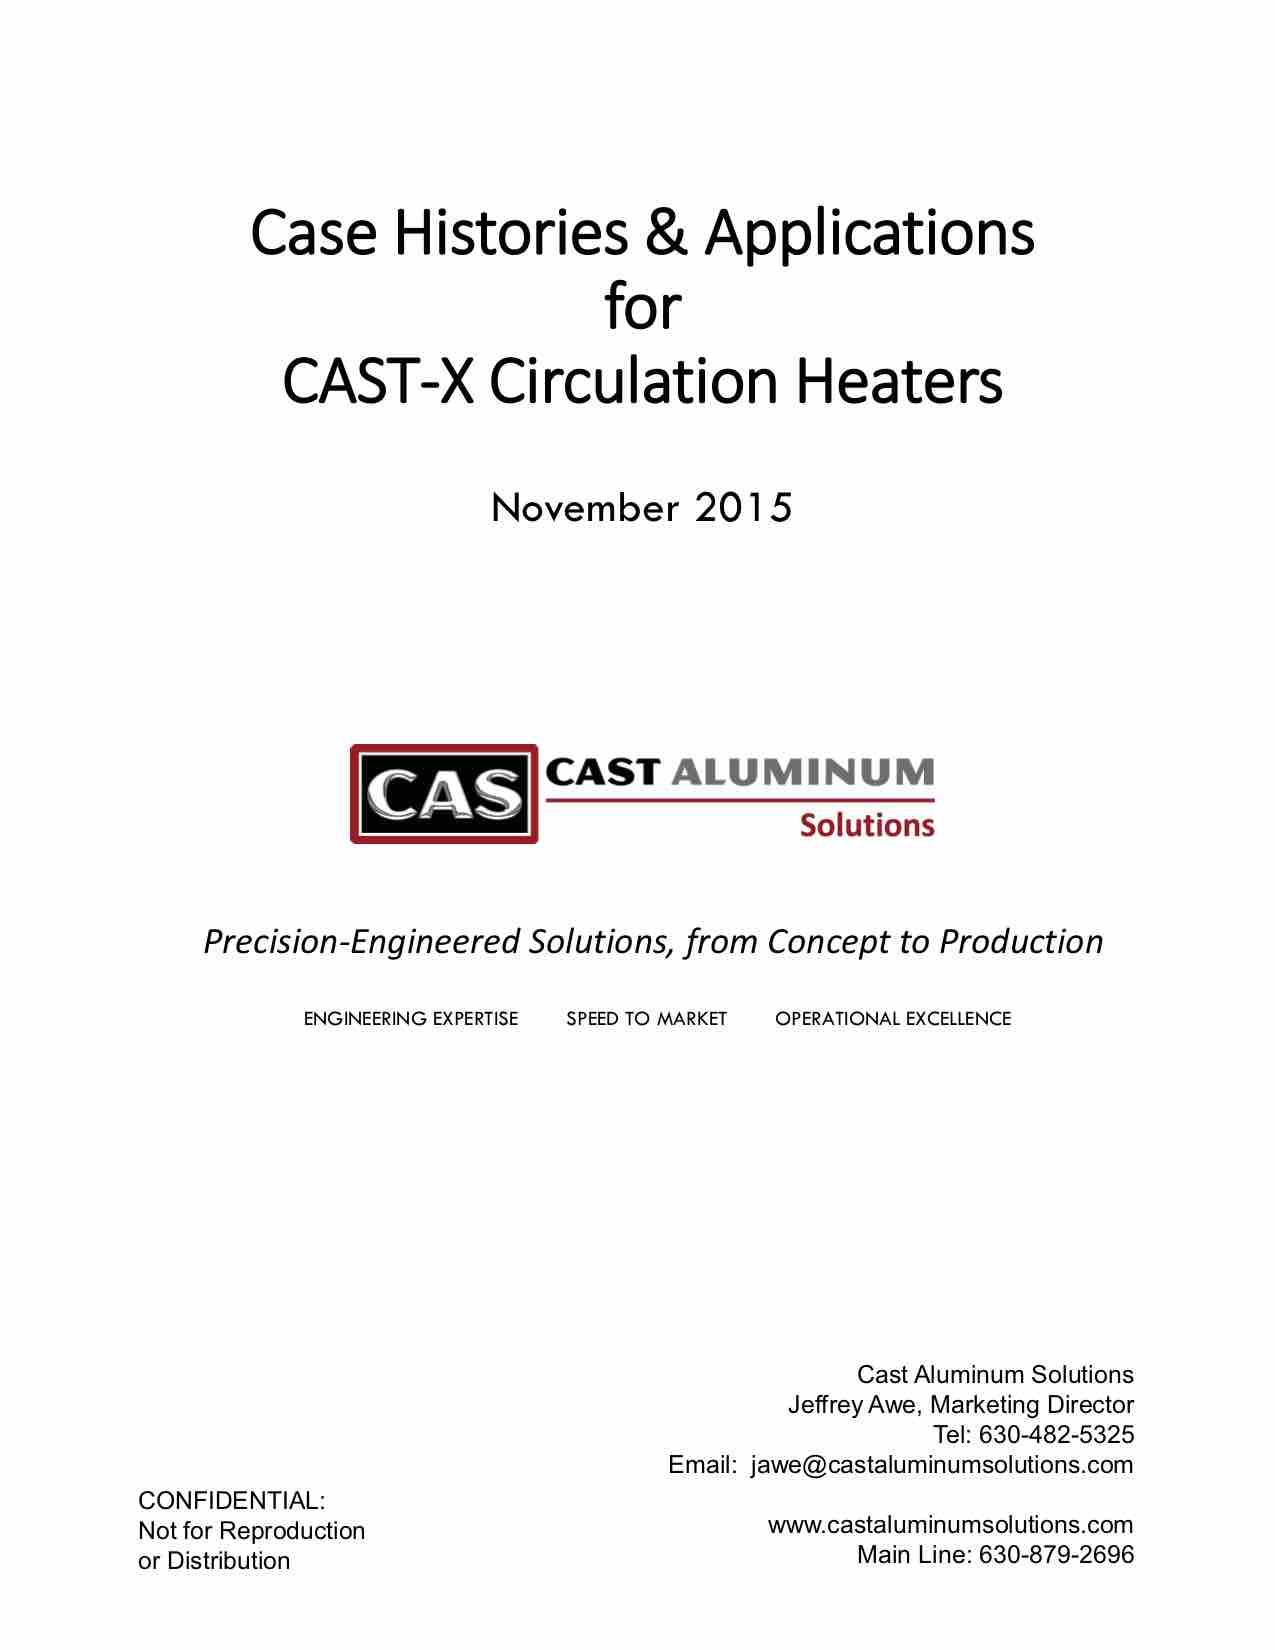 CAST X Circulation Heater Case Studies (dragged)